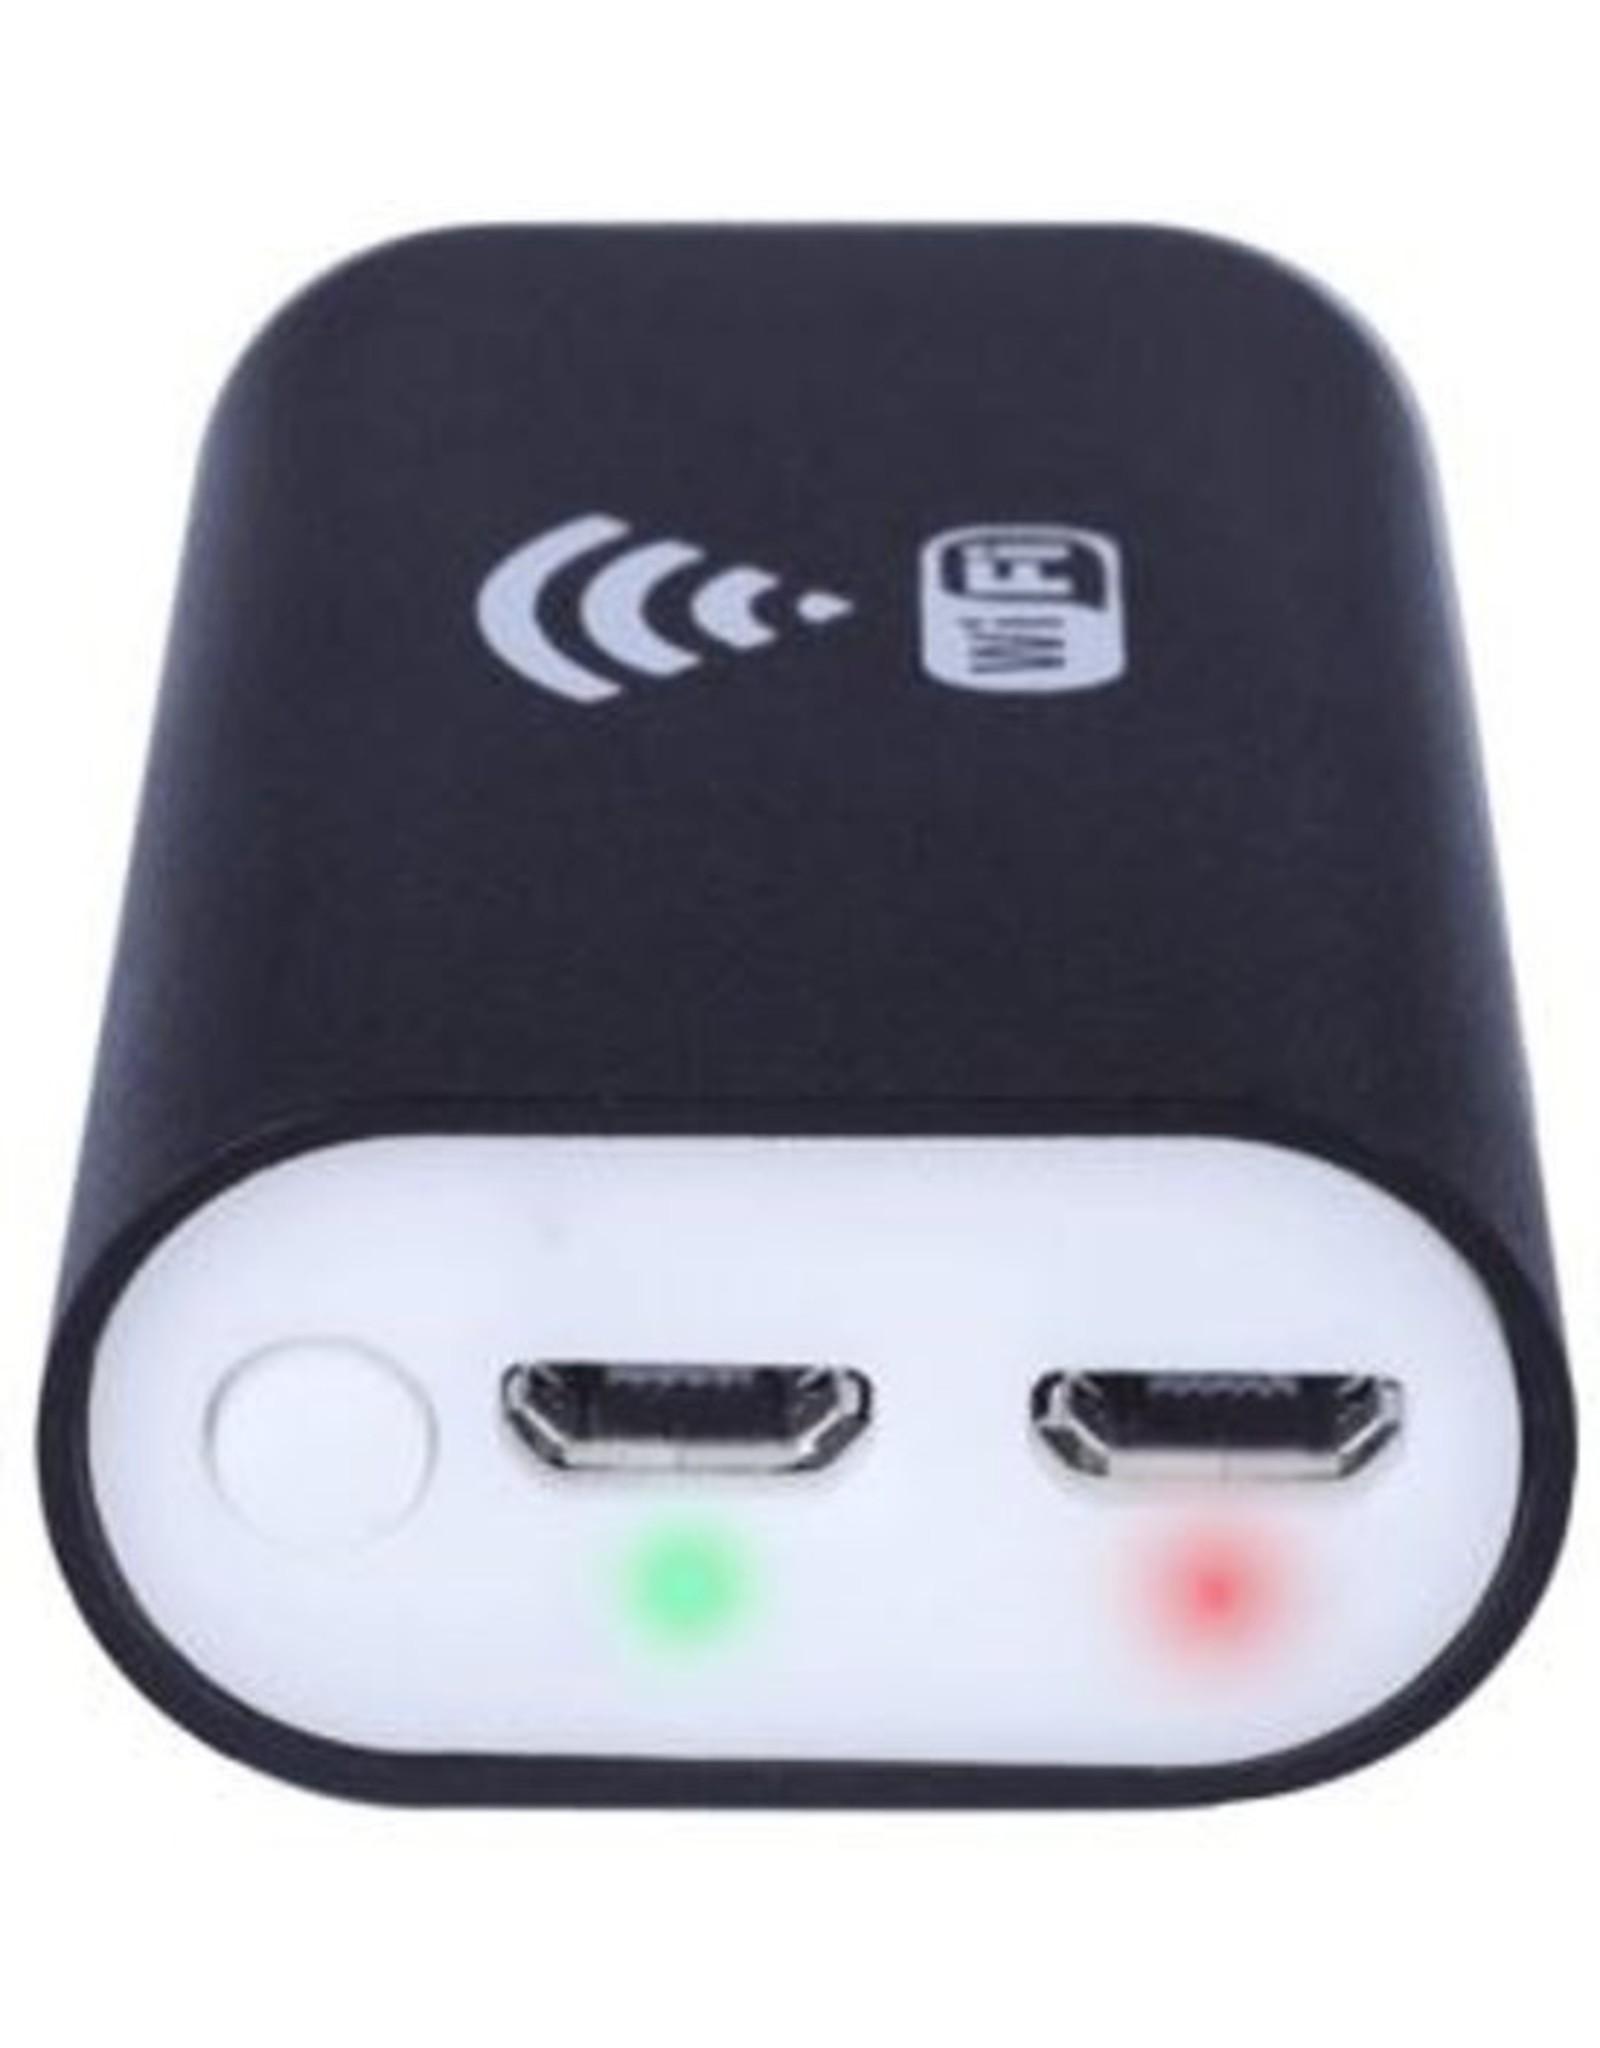 Merkloos Endoscoop - mini camera